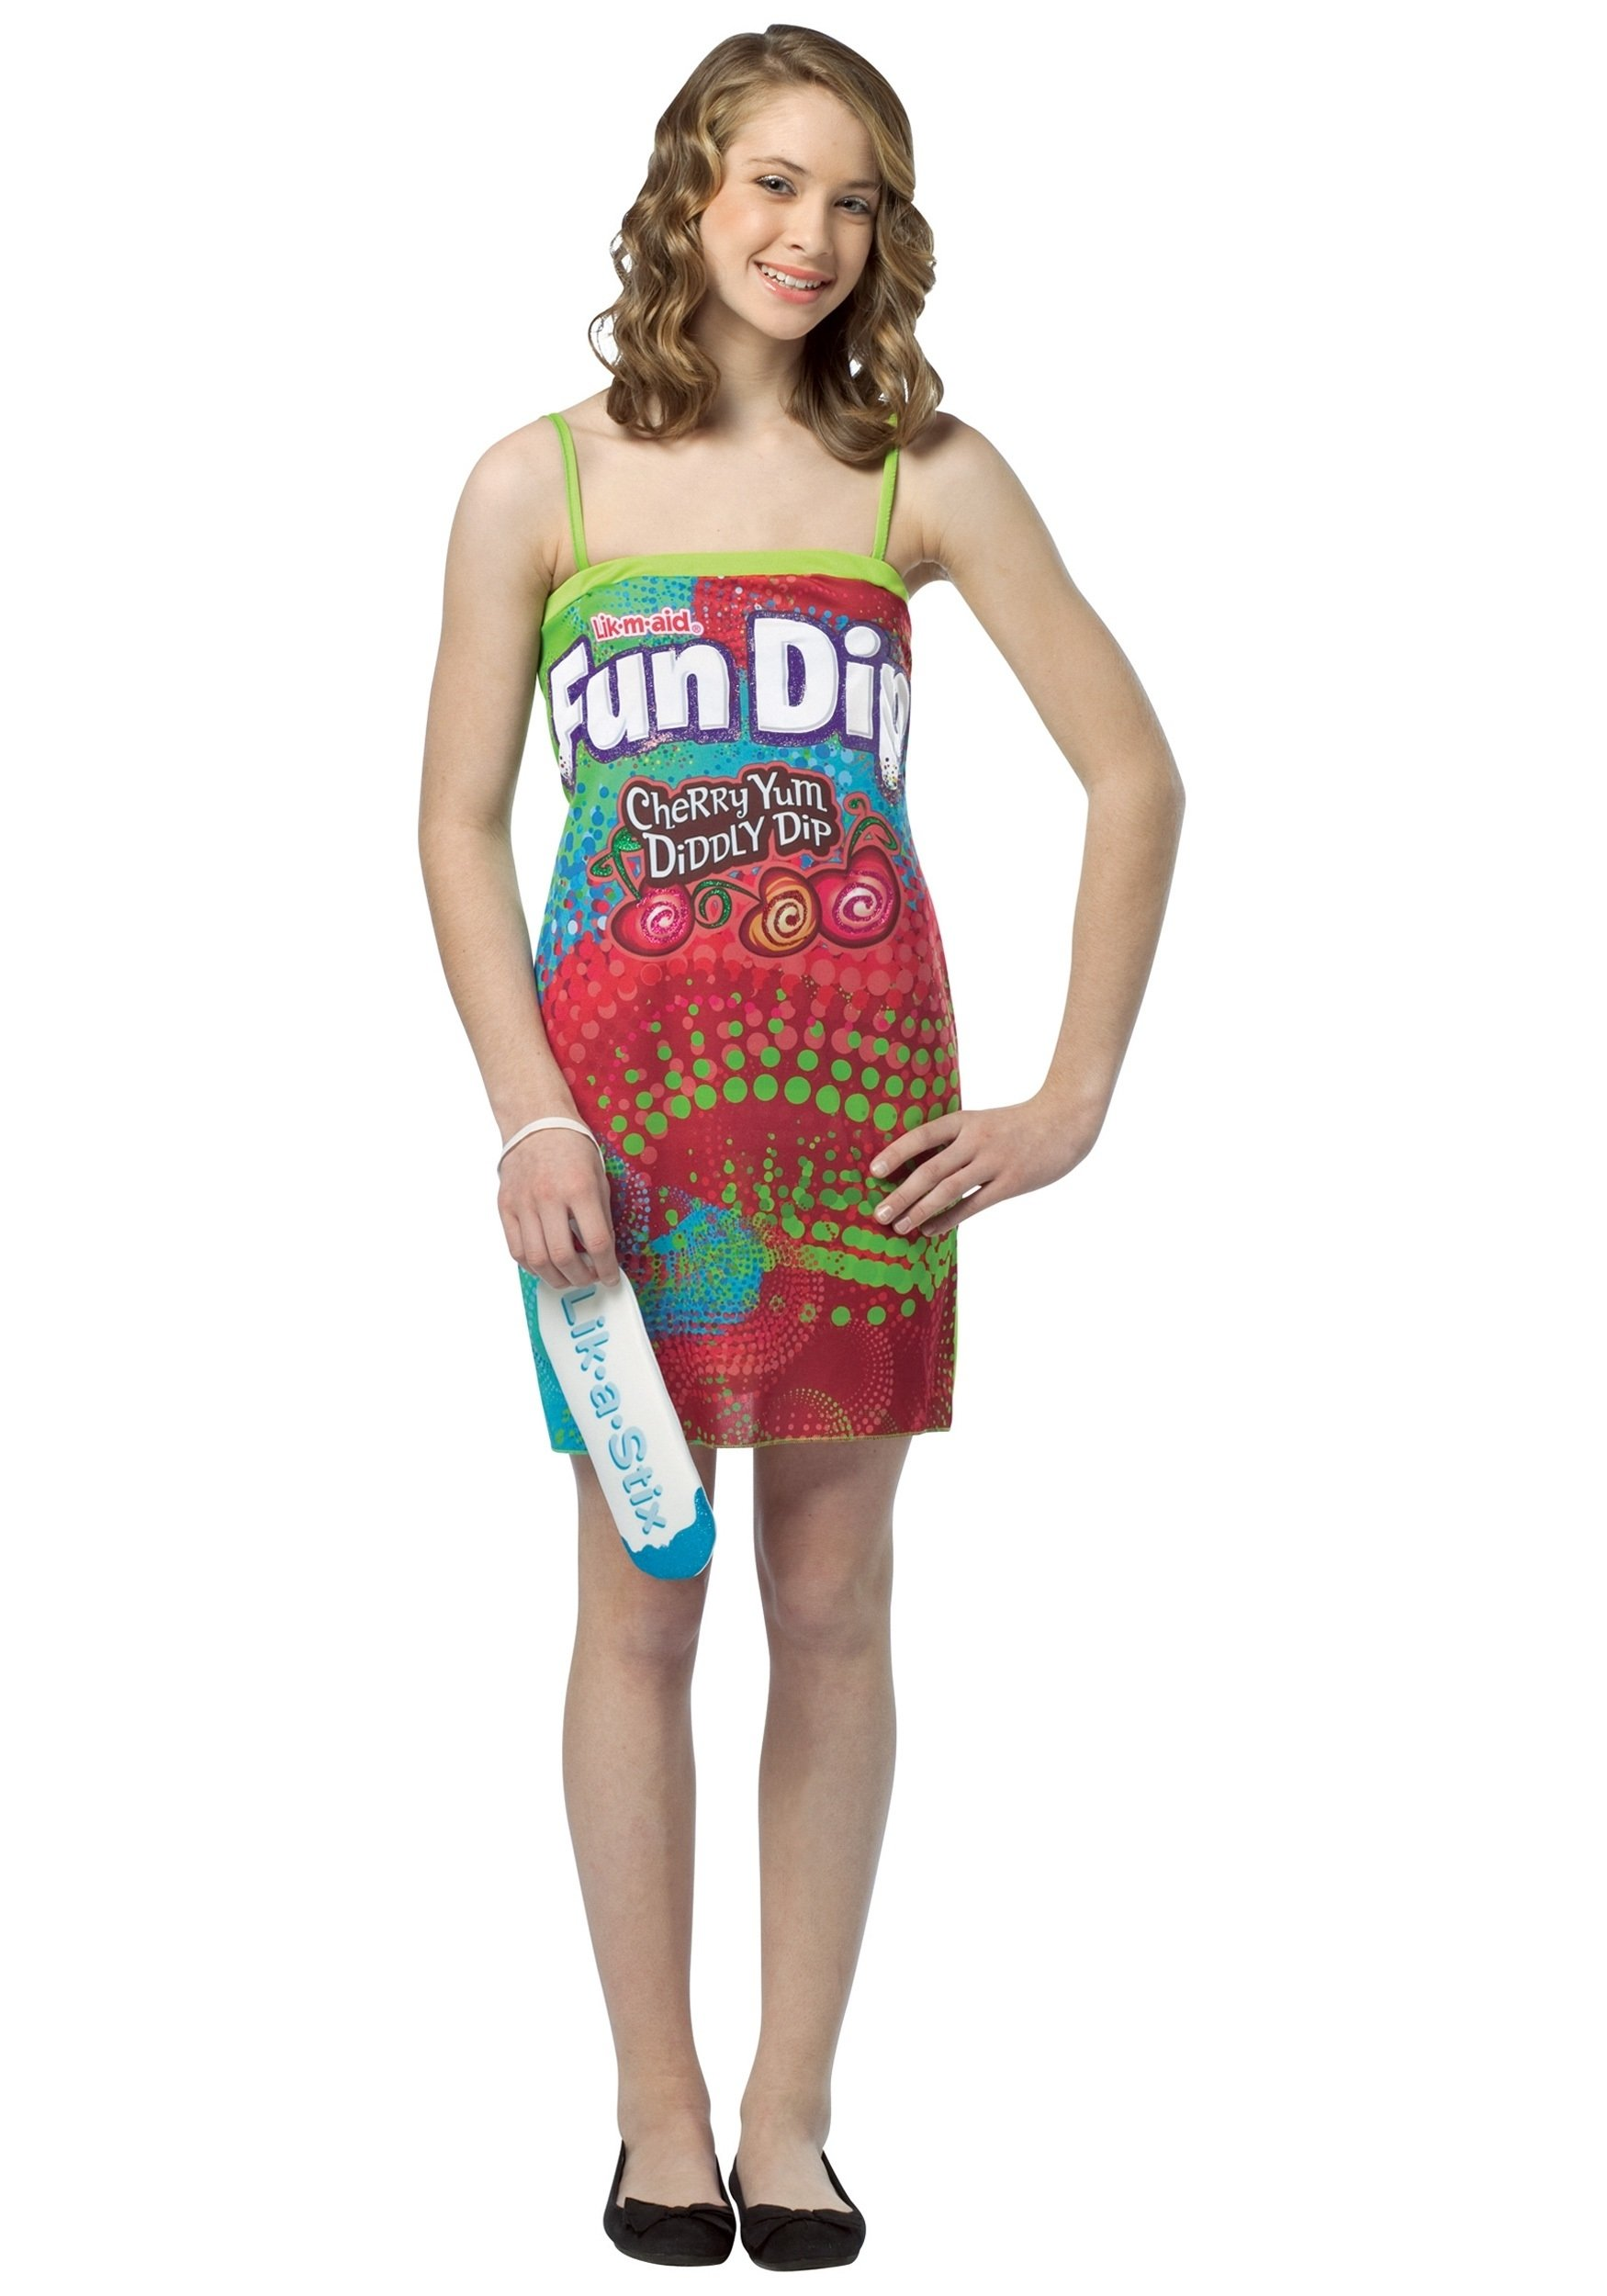 10 lovely cute costume ideas for teenage girls teen fun dip dress halloween costumes 1